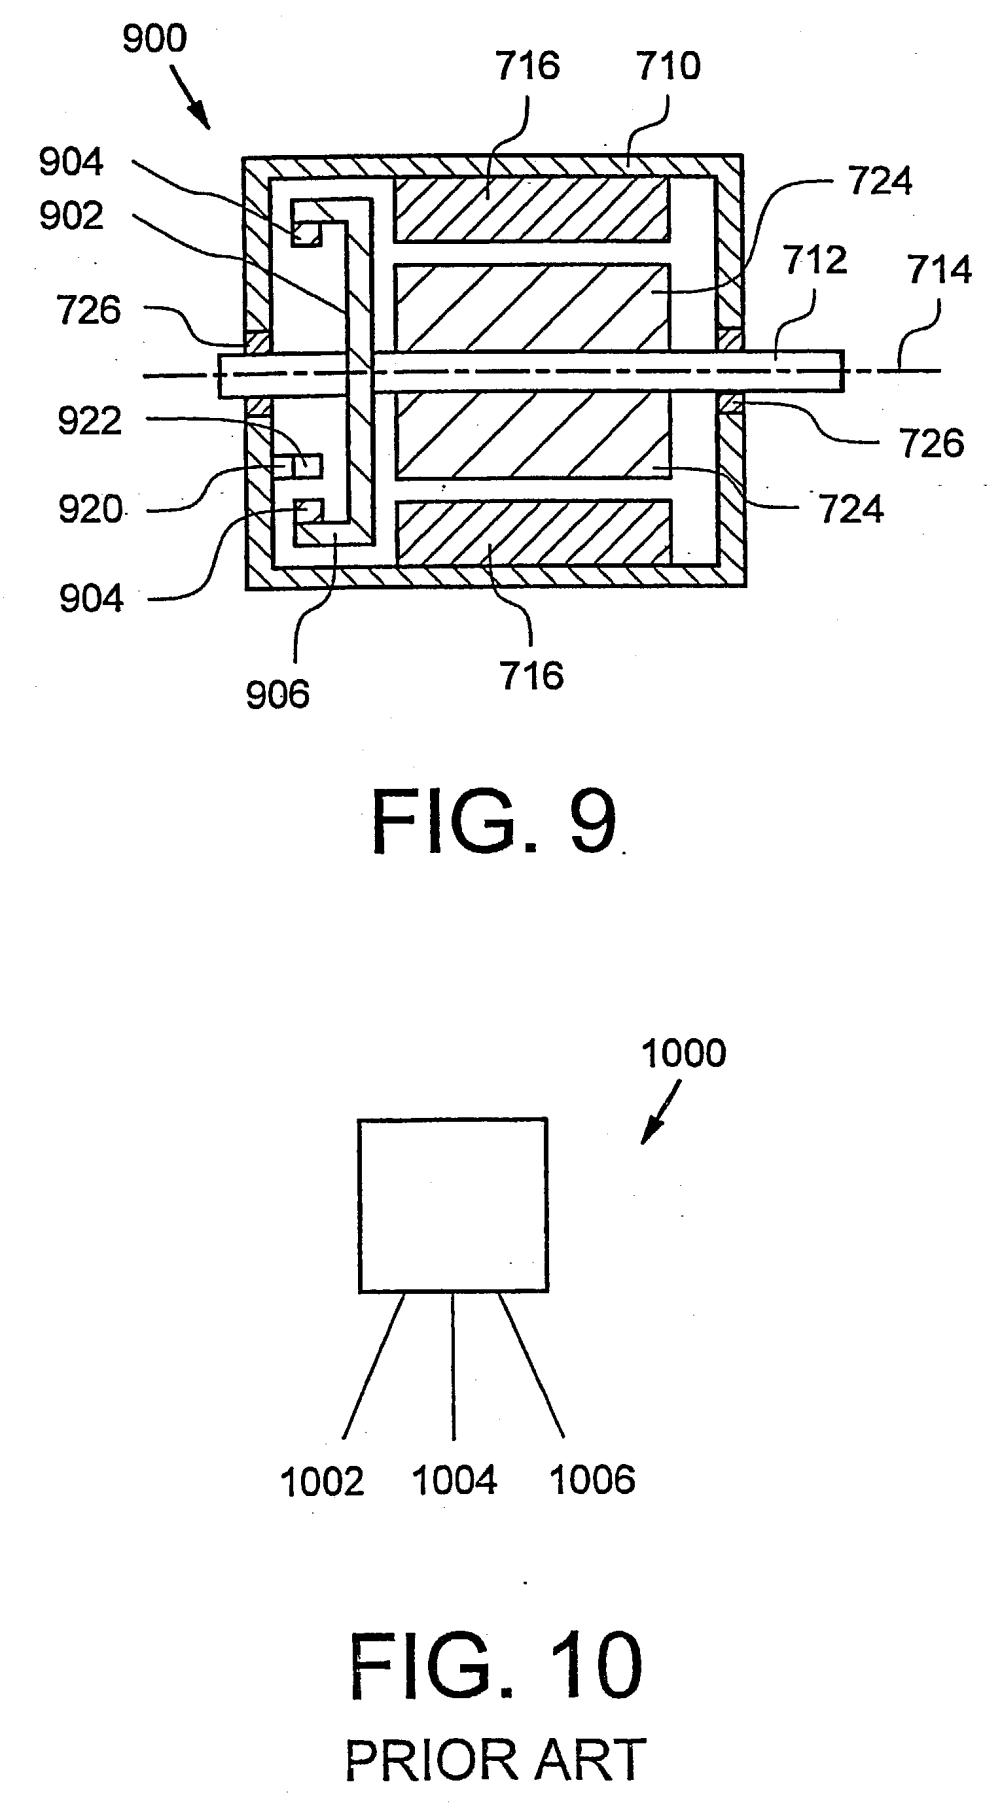 medium resolution of 139 53425srt wiring diagram basic electronics wiring diagram 139 53425srt wiring diagram